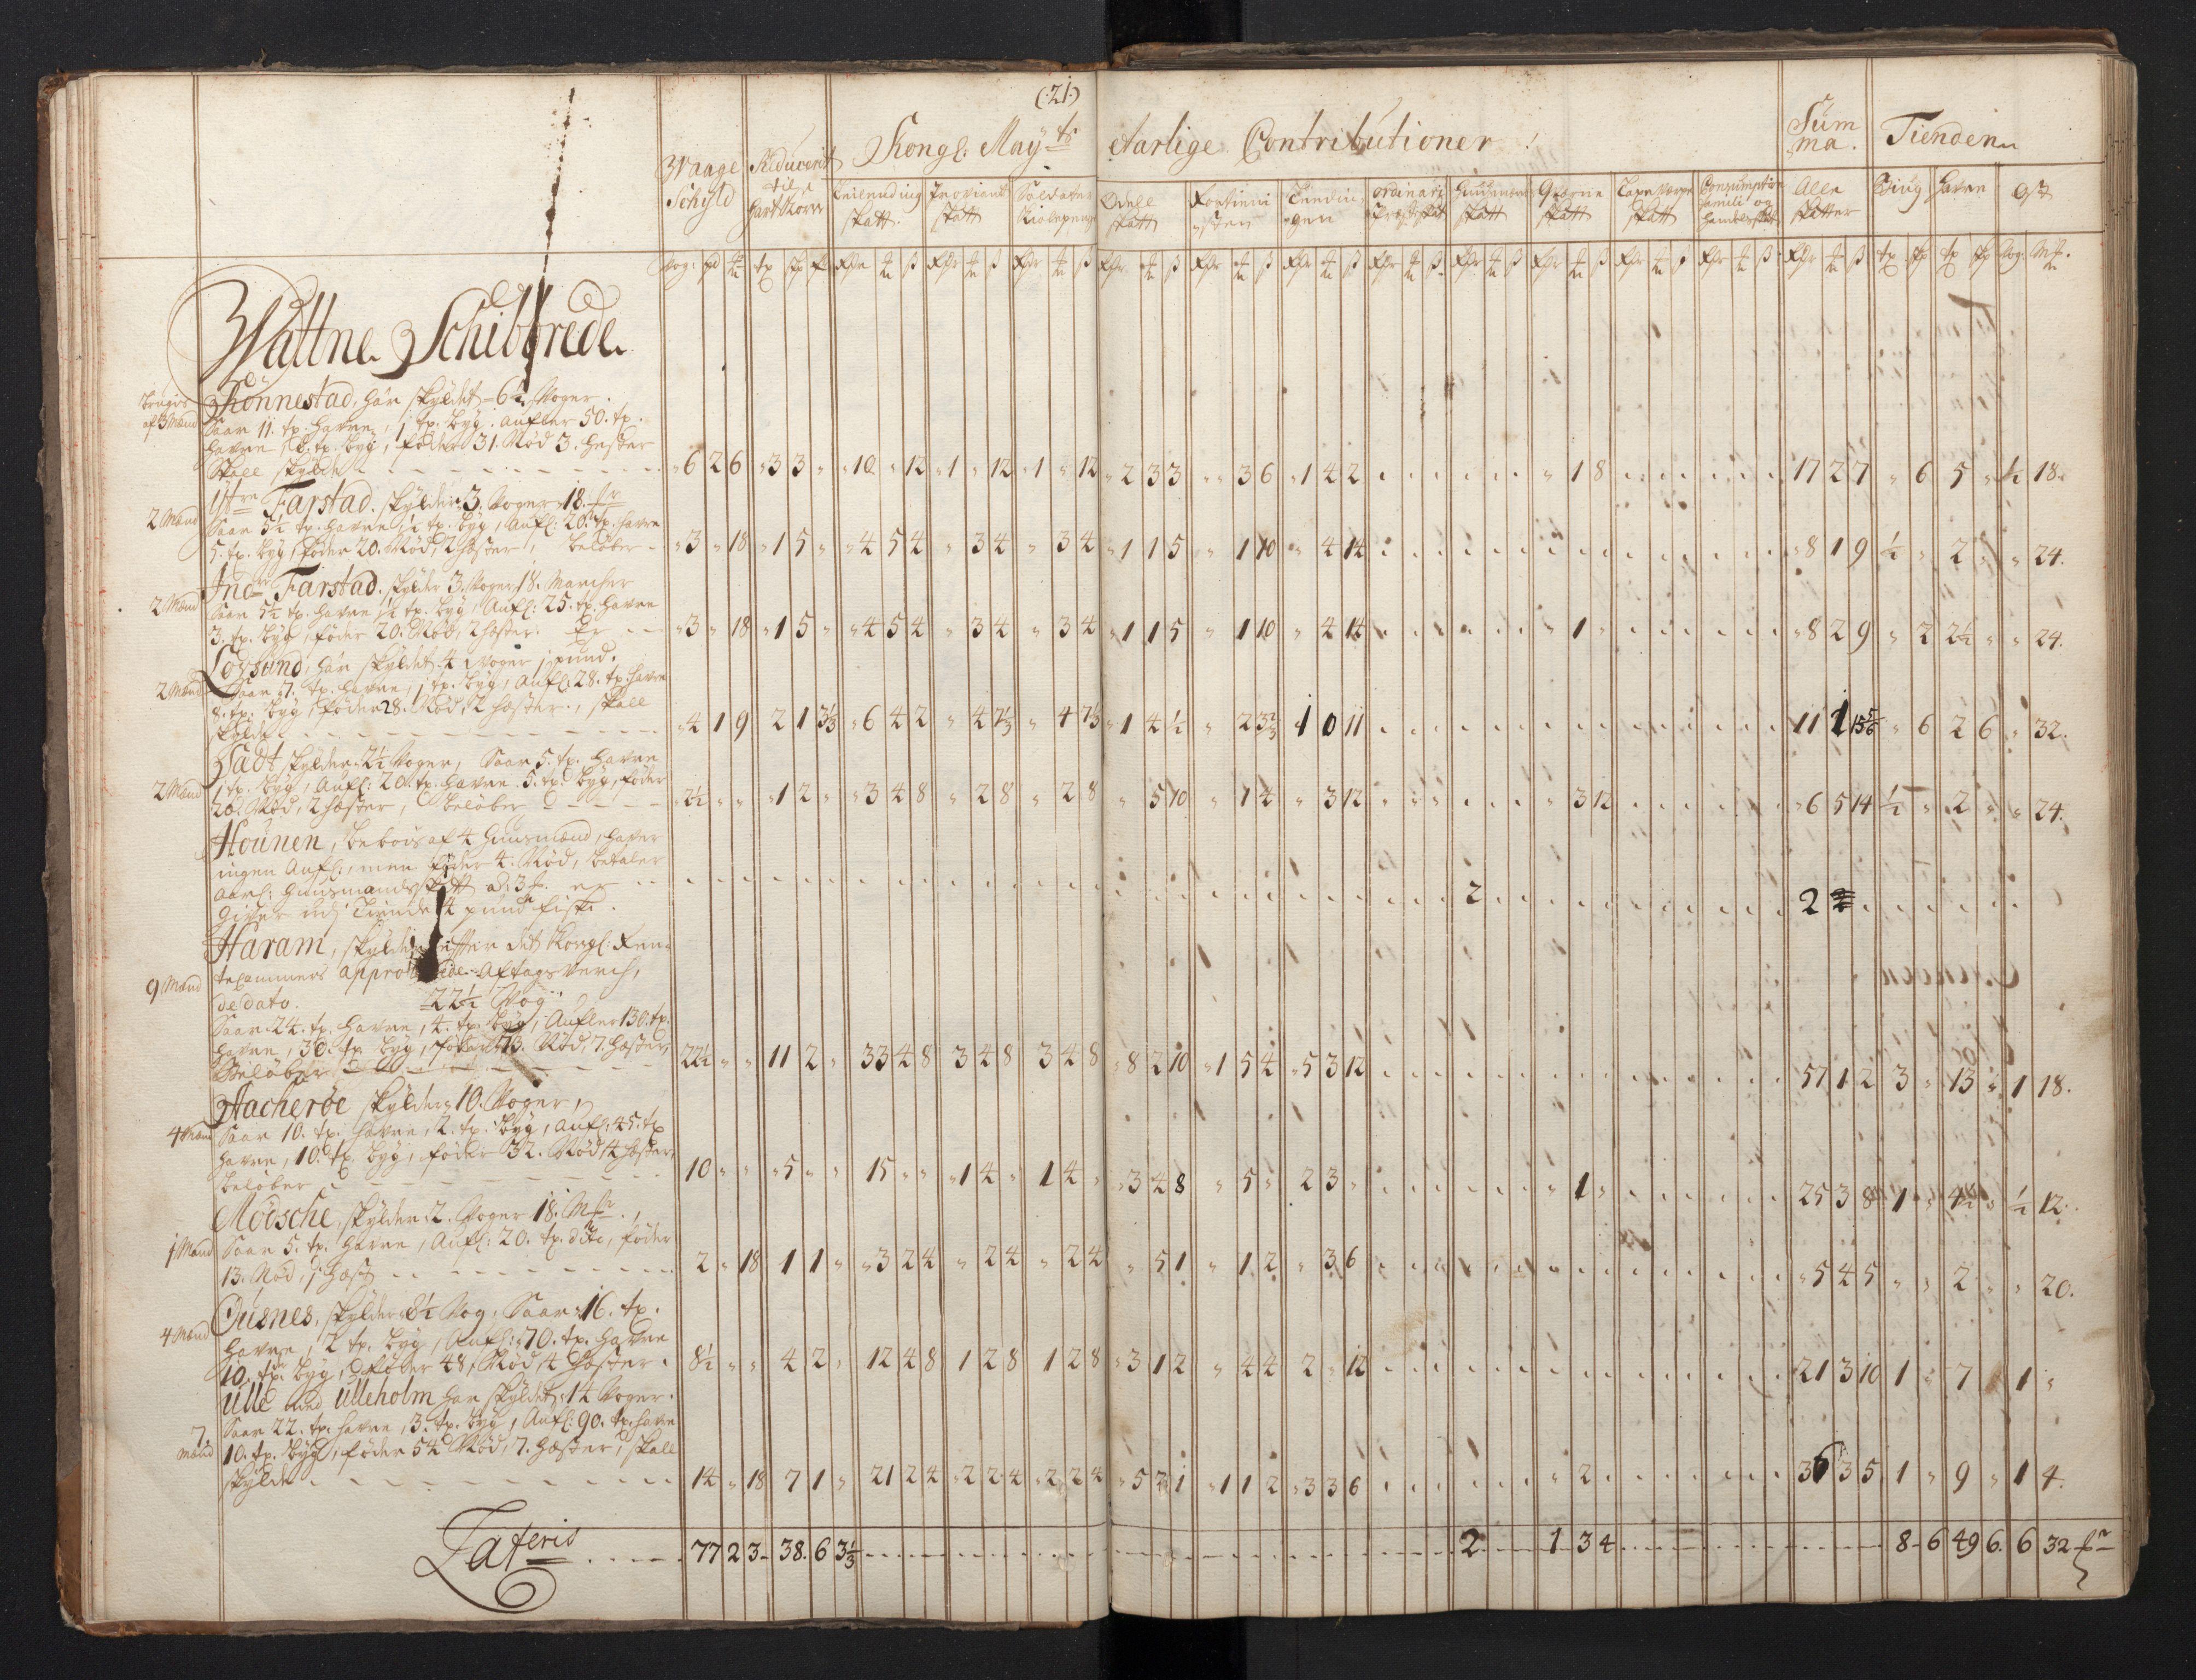 RA, Rentekammeret inntil 1814, Realistisk ordnet avdeling, N/Nb/Nbf/L0149: Sunnmøre, prøvematrikkel, 1714, s. 20b-21a